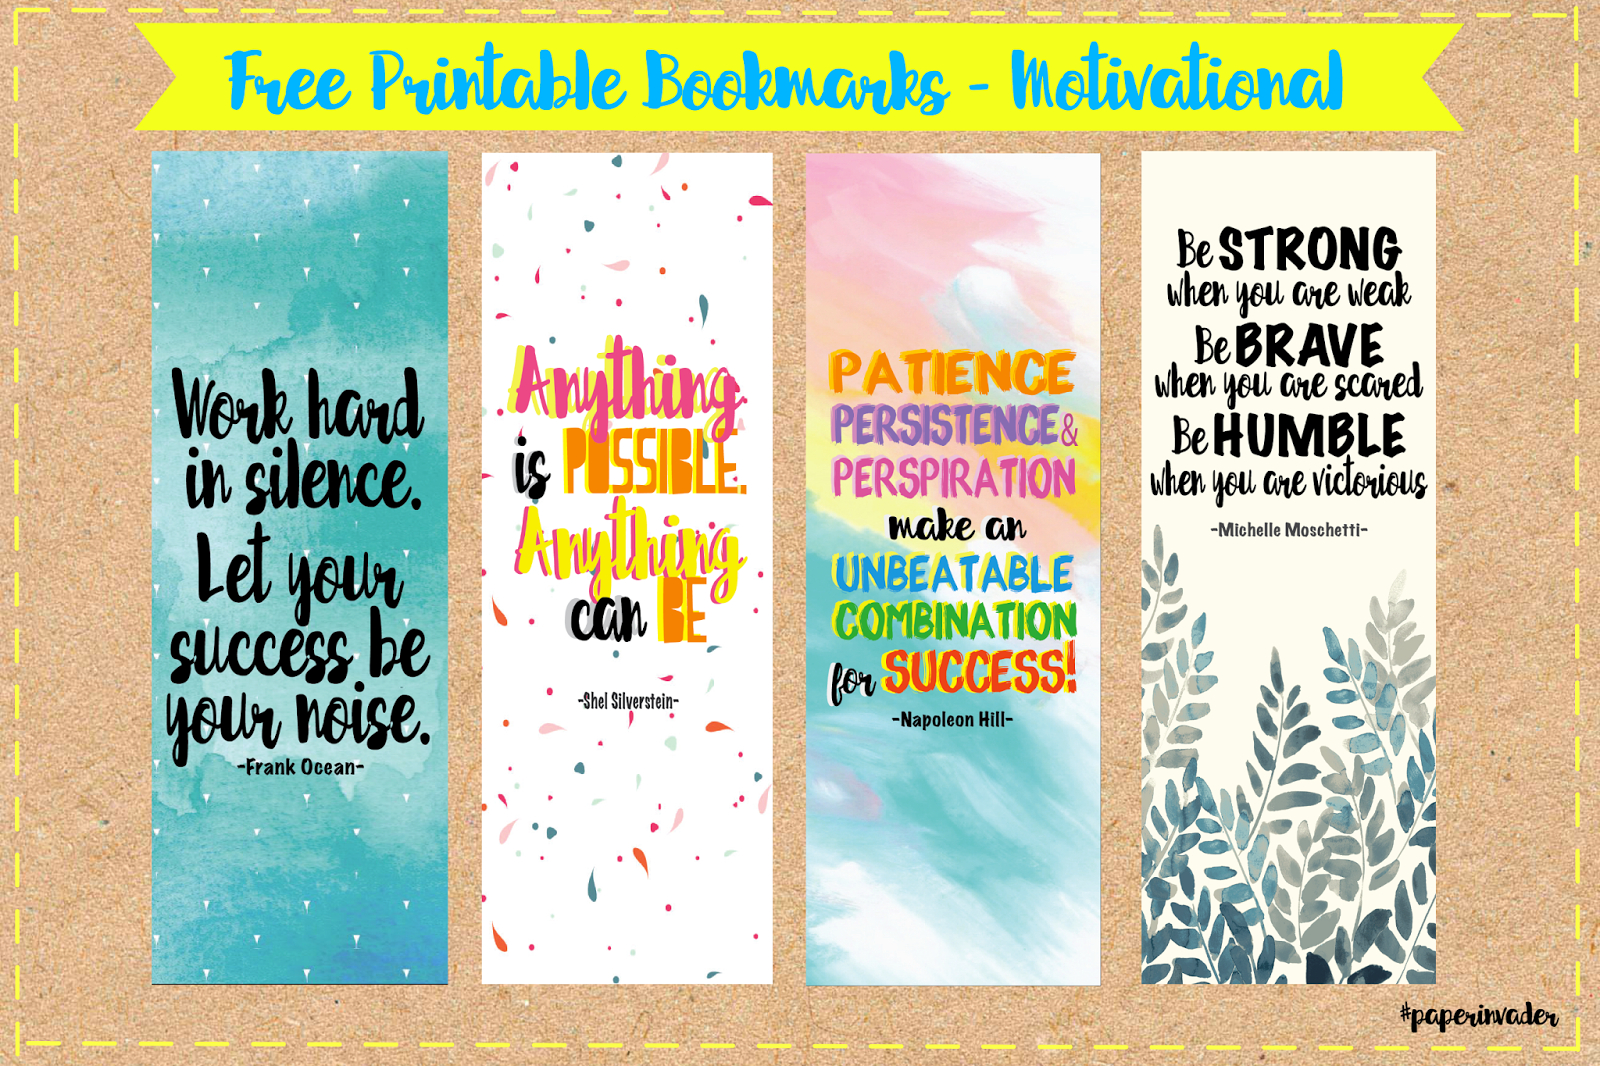 Paper Invader: Free Printable Bookmarks - Motivational - Free Printable Back To School Bookmarks